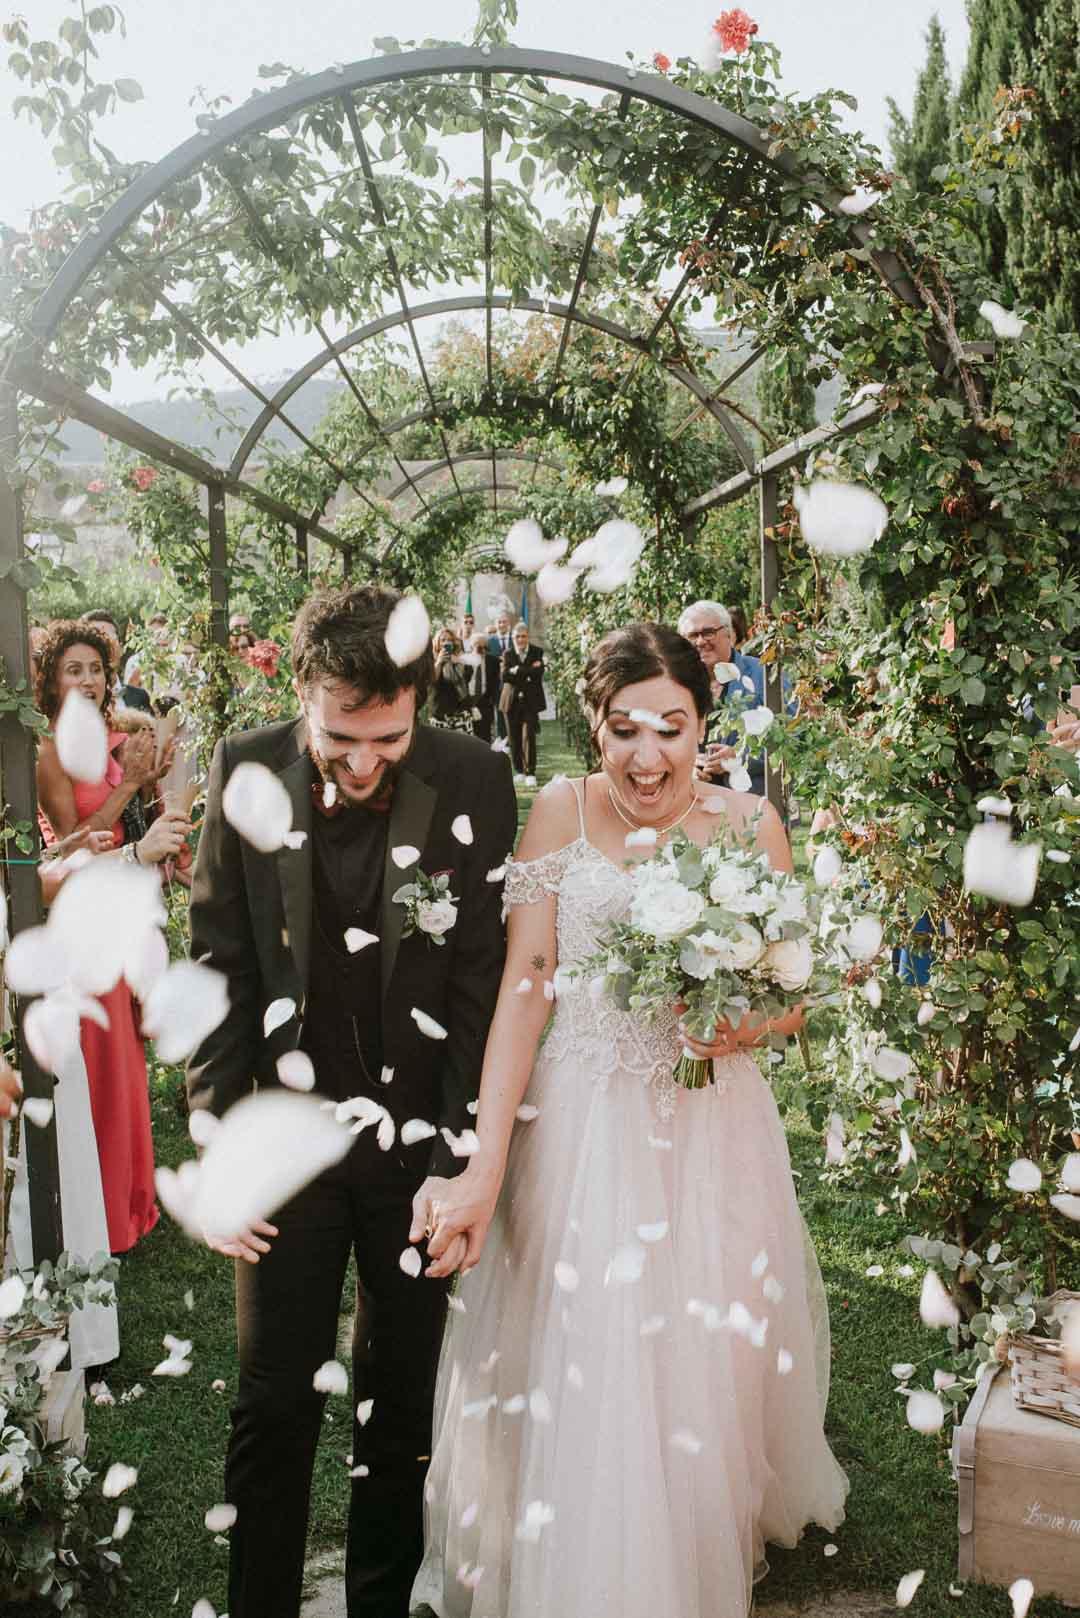 wedding-photographer-destination-fineart-bespoke-reportage-tuscany-villascorzi-vivianeizzo-spazio46-88